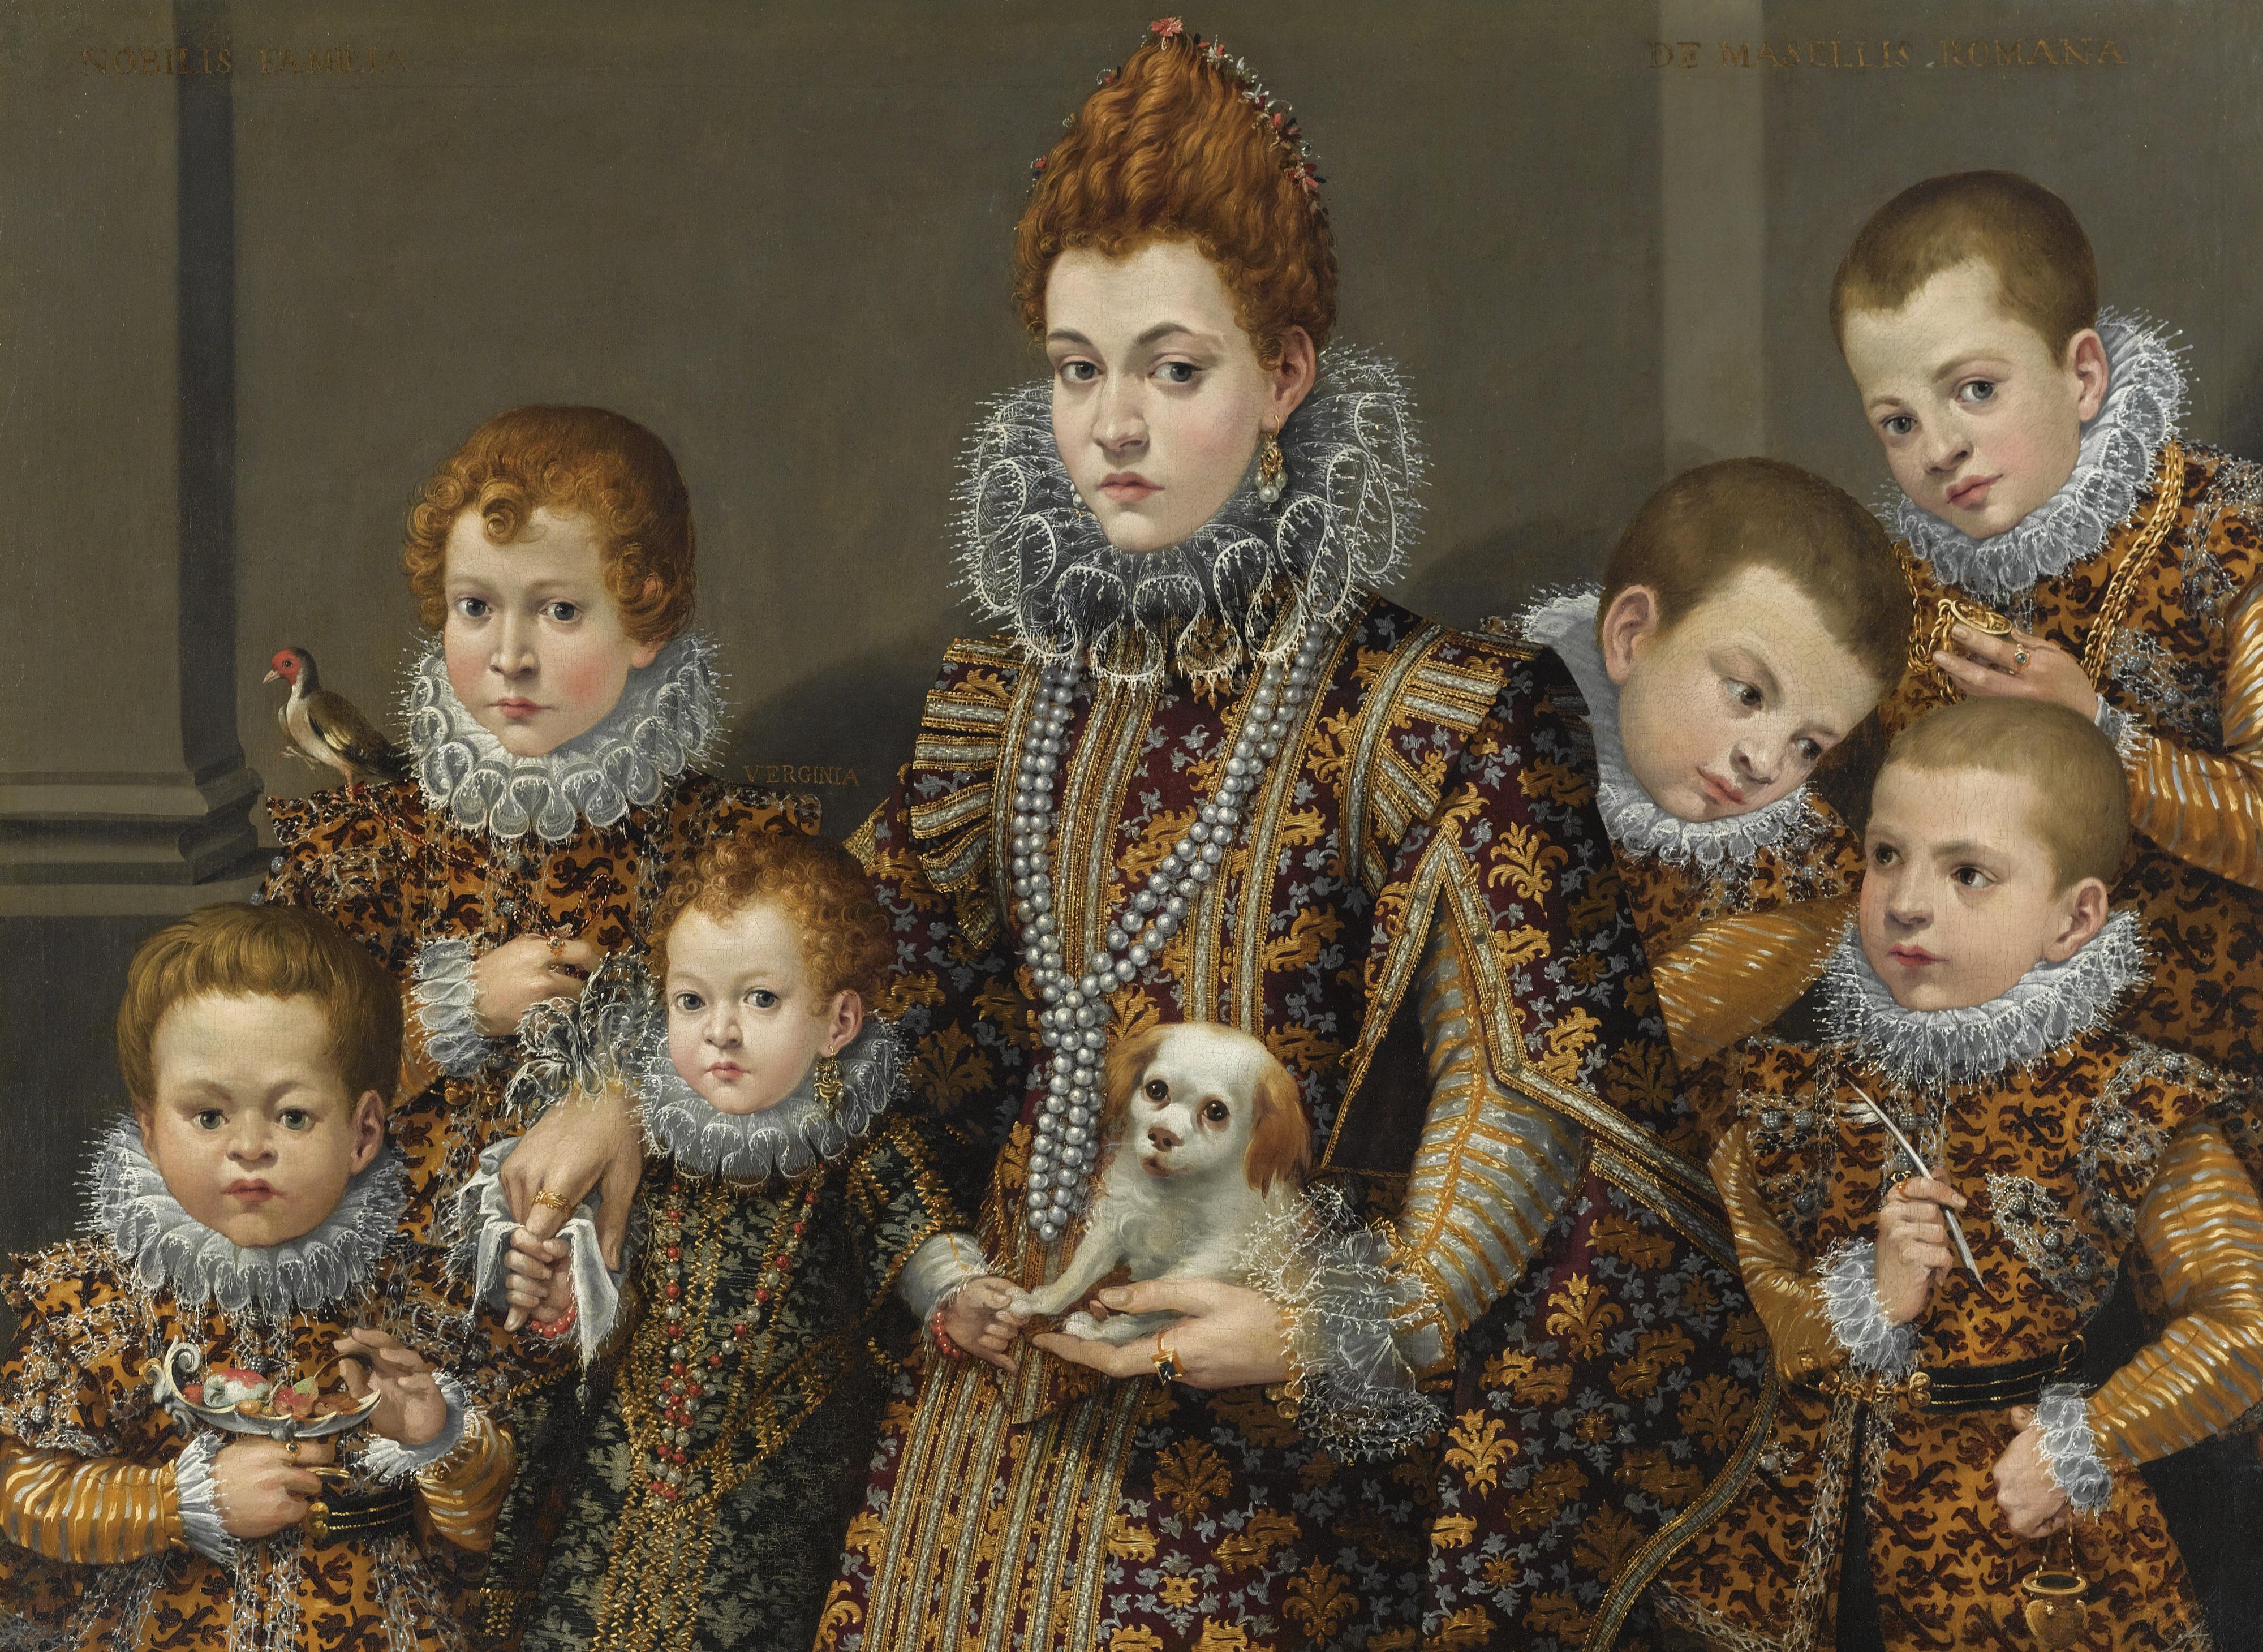 lavinia_fontana_portrait_of_bianca_degli_utili_maselli_and_her_children.jpg